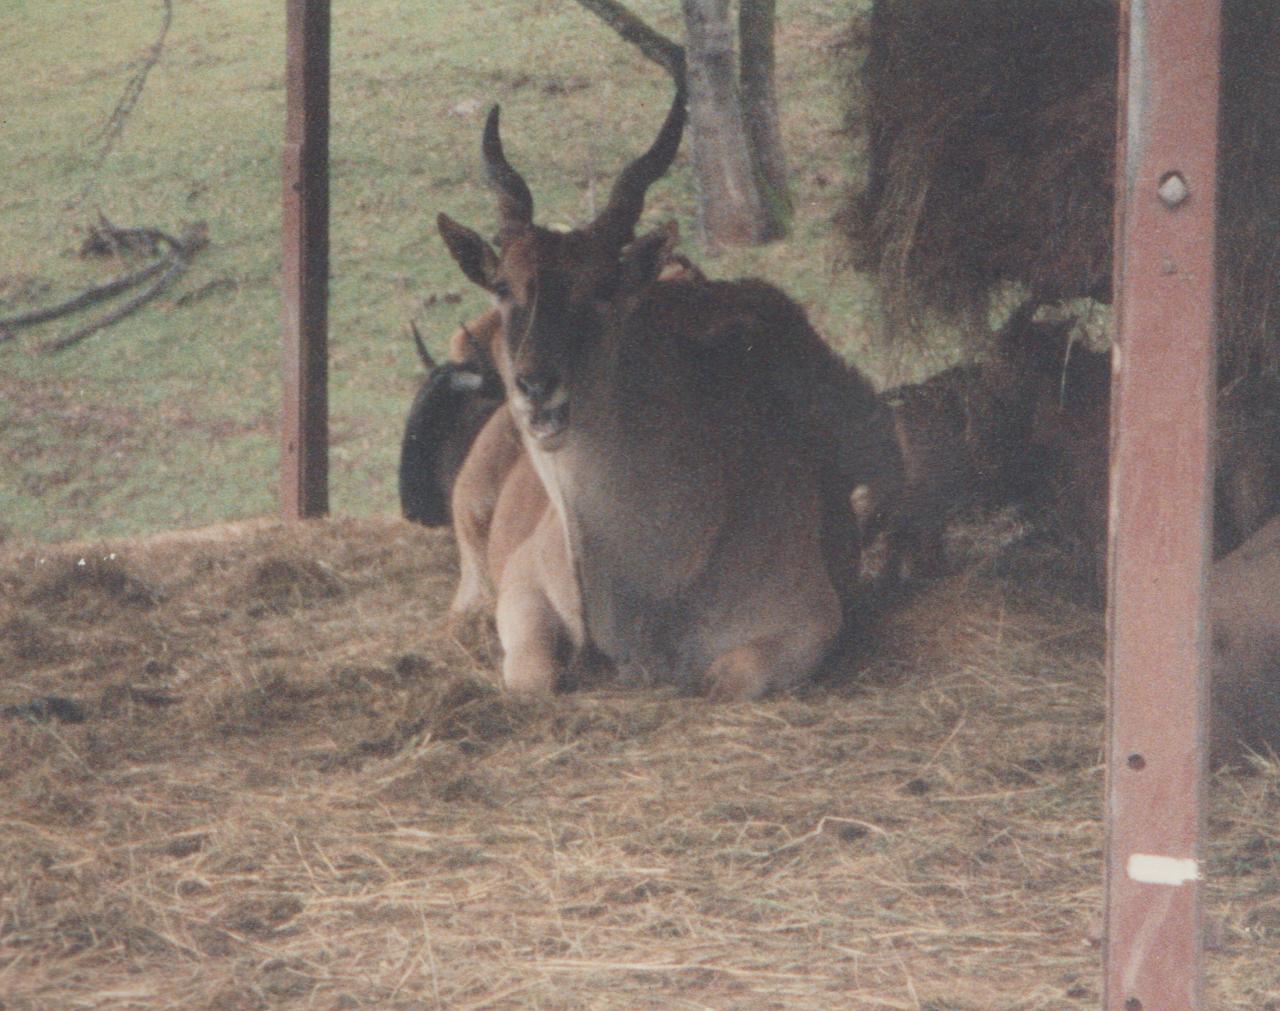 1992-12-26 - Saturday - Wildlife Safari Trip, Marilyn, Crystal-02.png